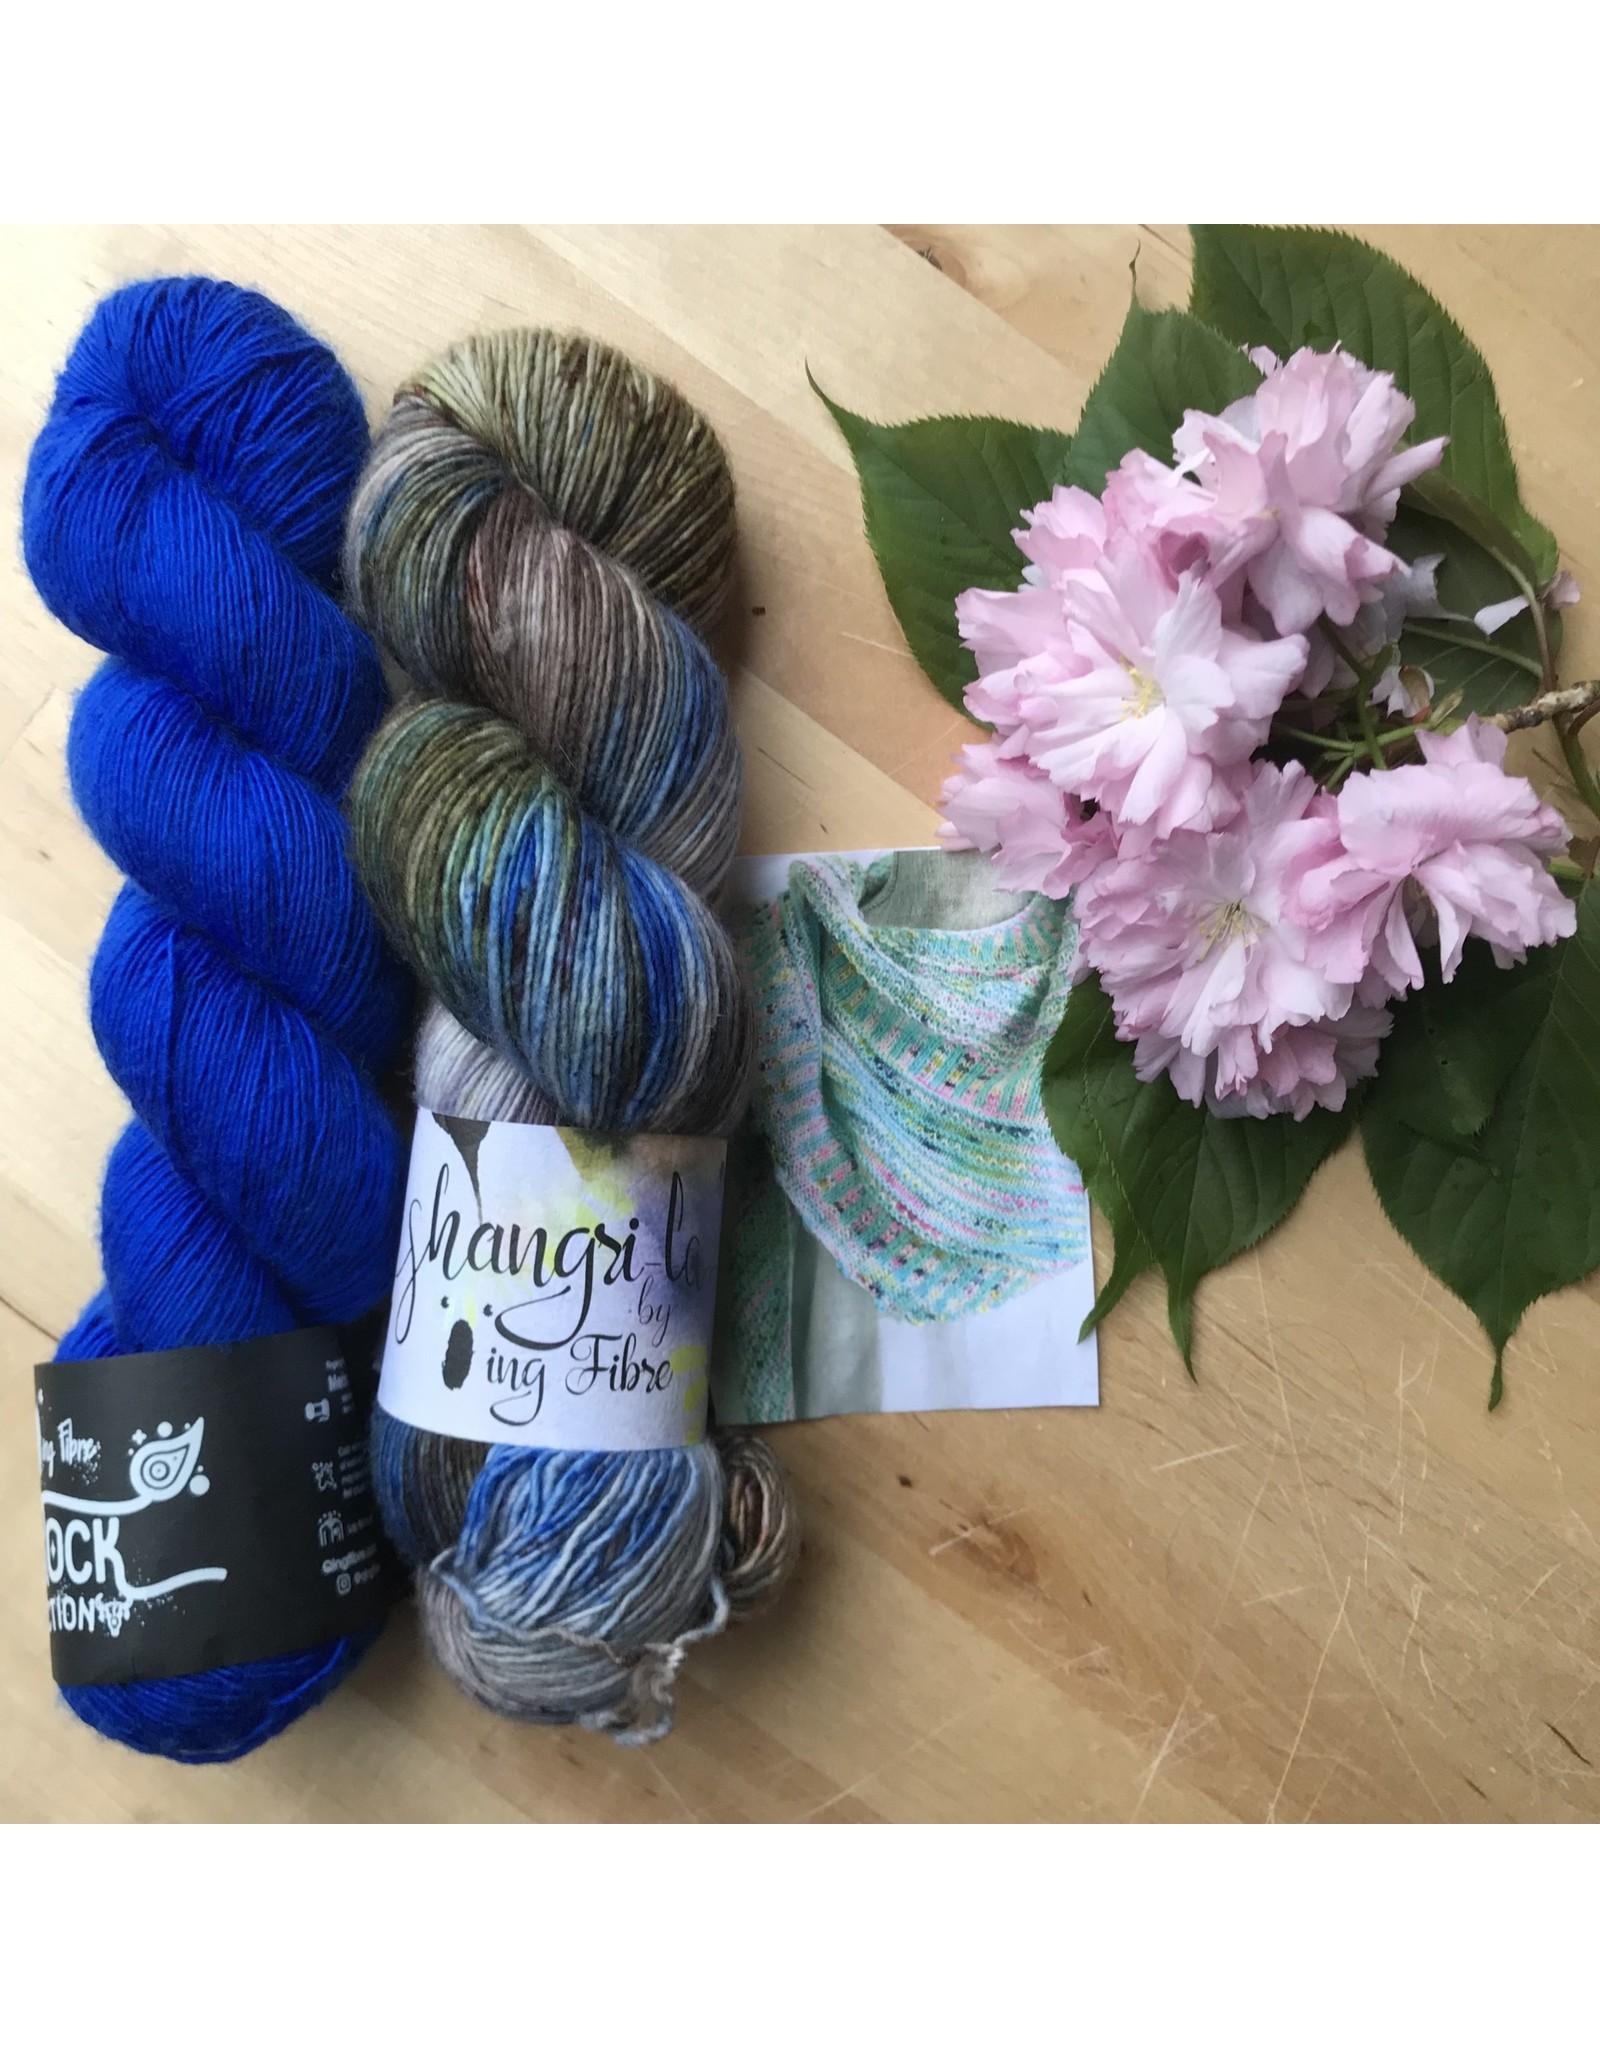 Qing Fibre Breathe & Hope Shawl Kit - Qing Fibers Rich Blue